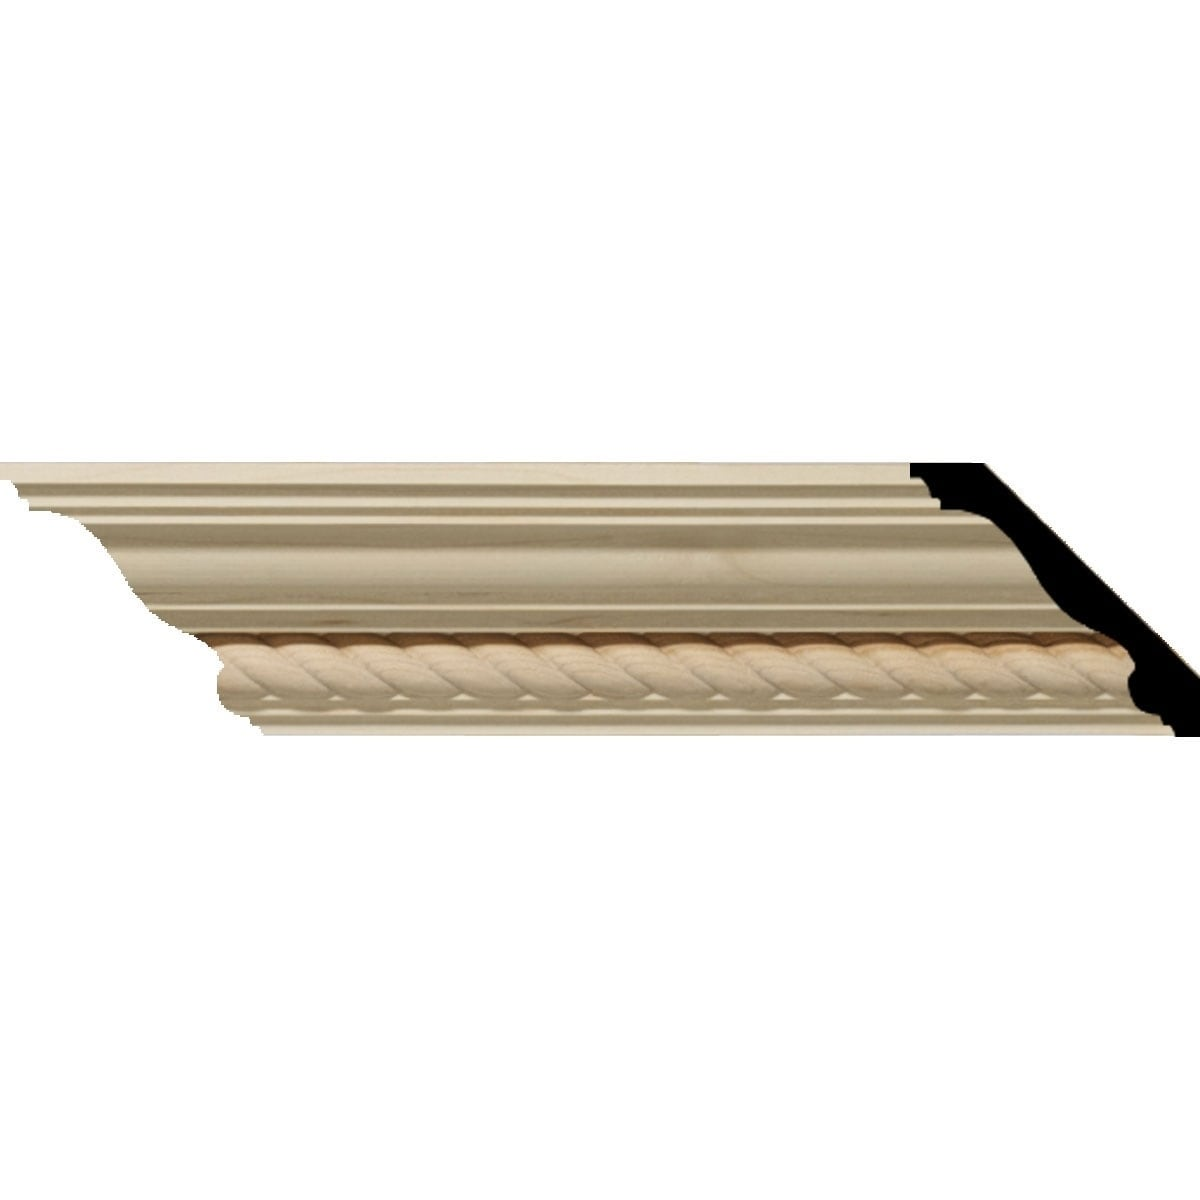 3 1/2H x 3 5/8P x 5F x 94 1/2L Andrea Wood Crown Moulding, Alder (Alder - 2-Pack)